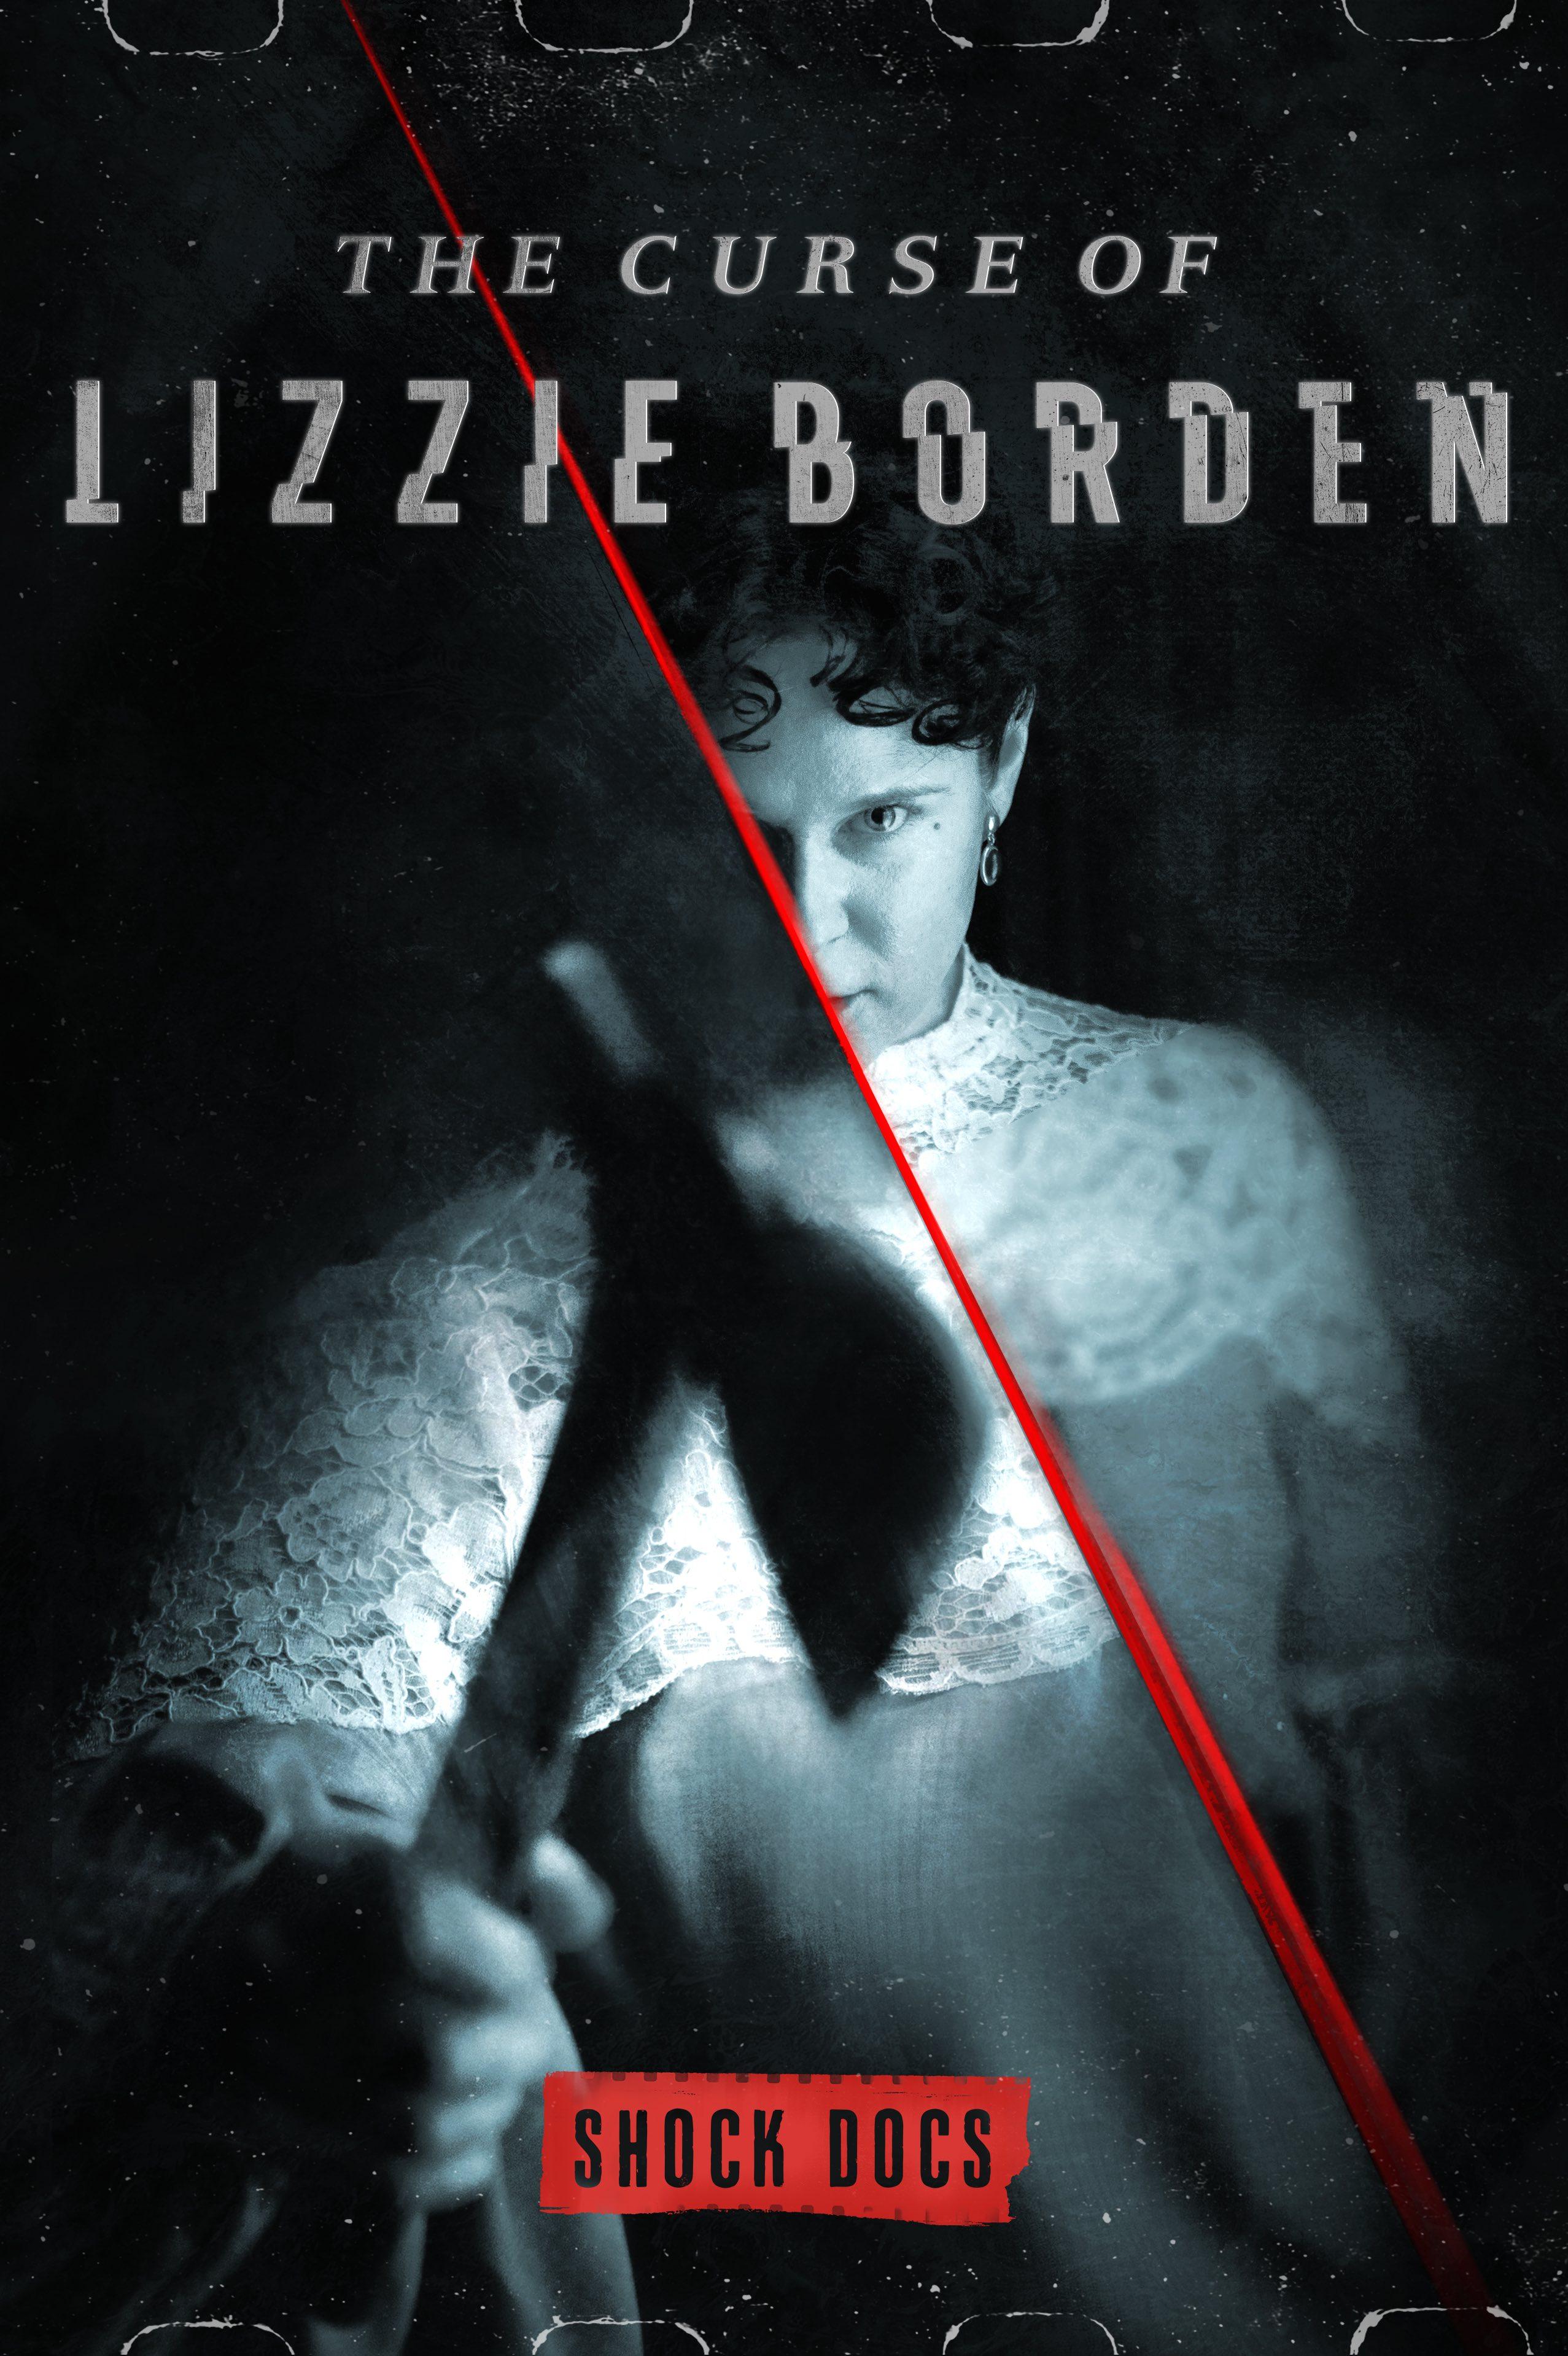 Watch Movie The Curse of Lizzie Borden